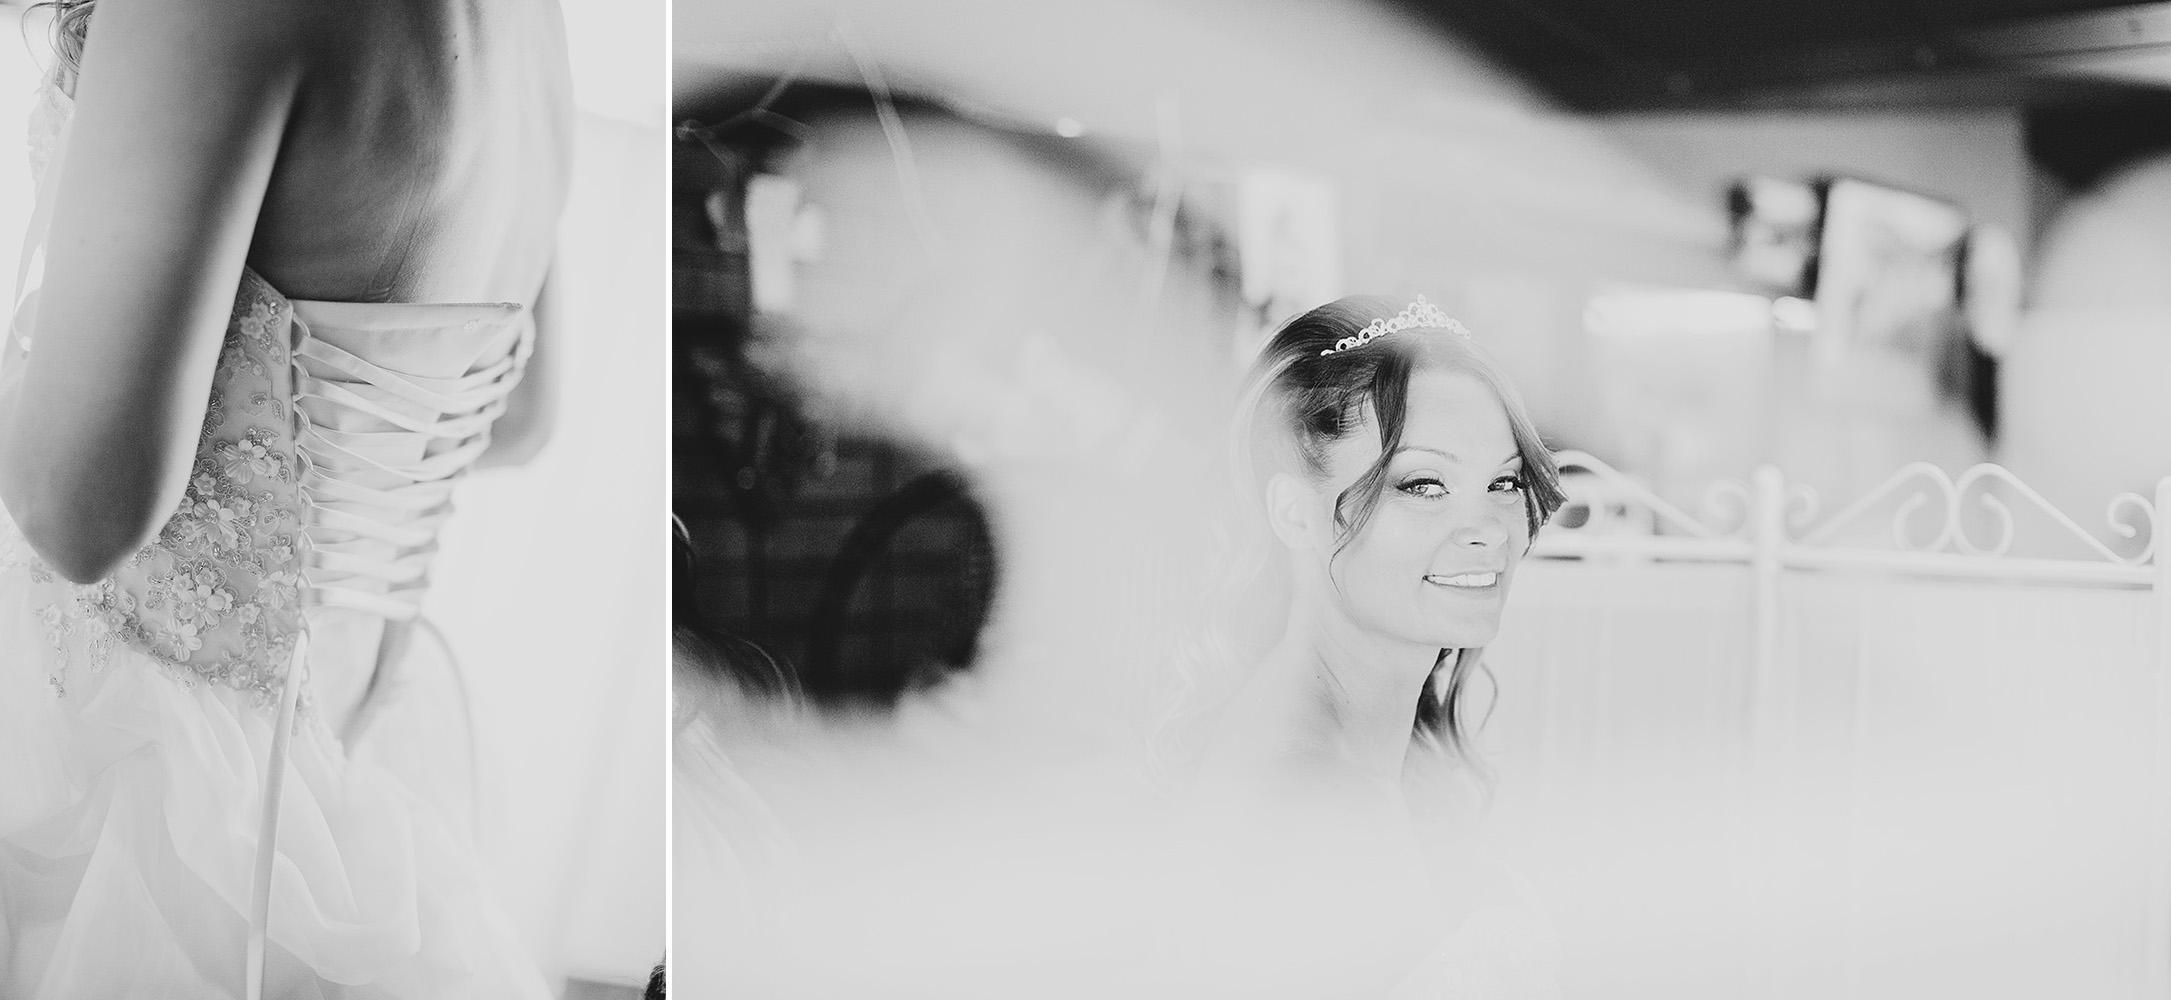 One Tree Hill Wedding Photography Art Through Da Vinces Eyes 07.jpg